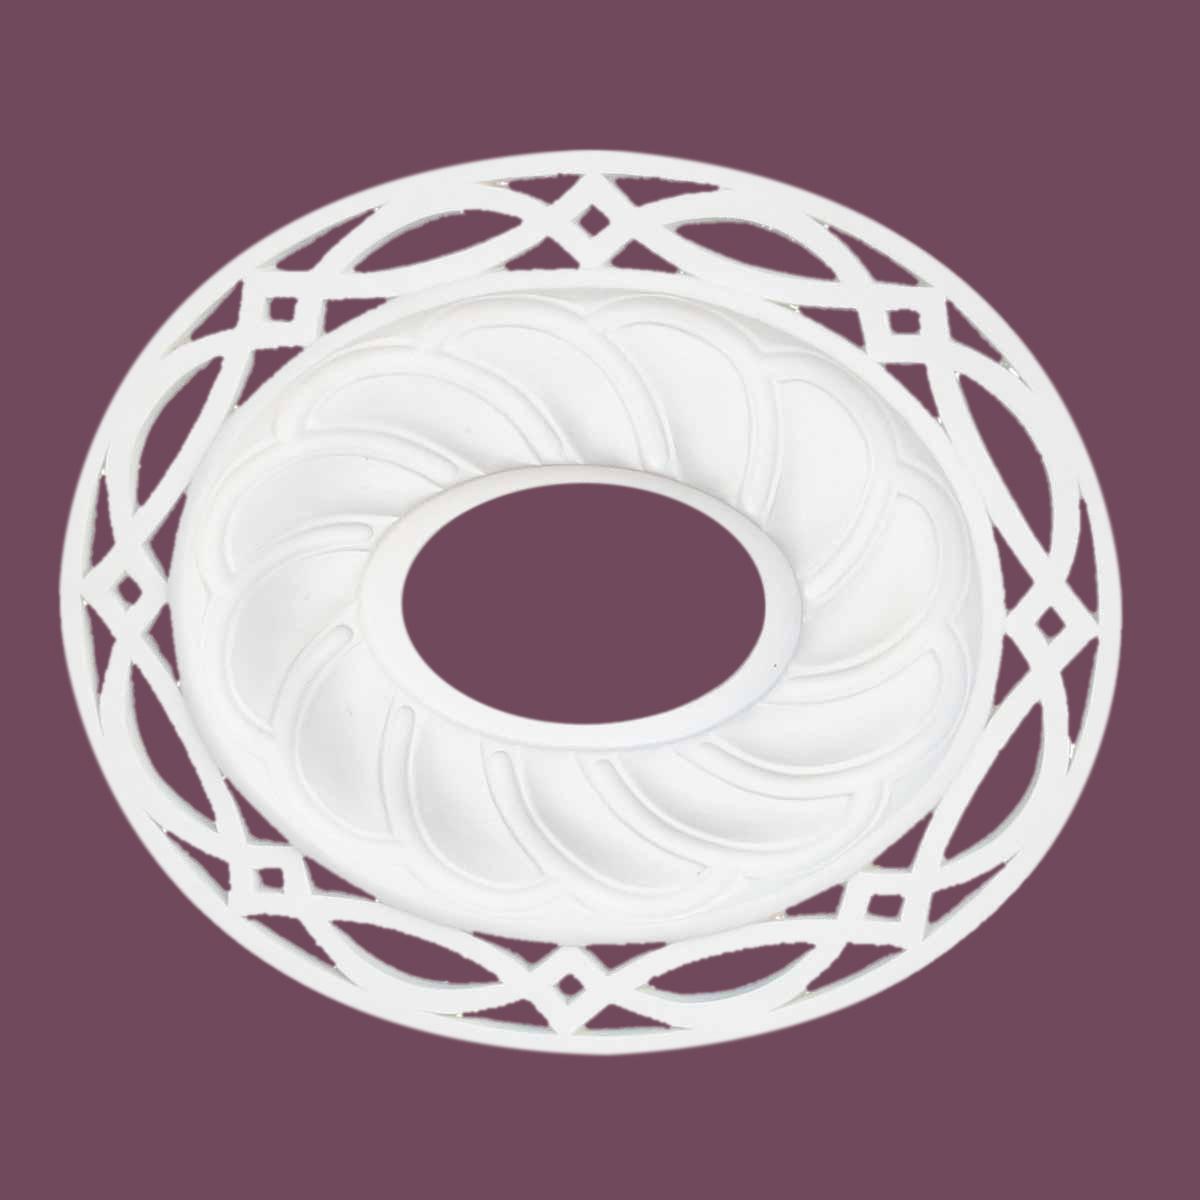 Ceiling Medallion White Urethane 17 11/16